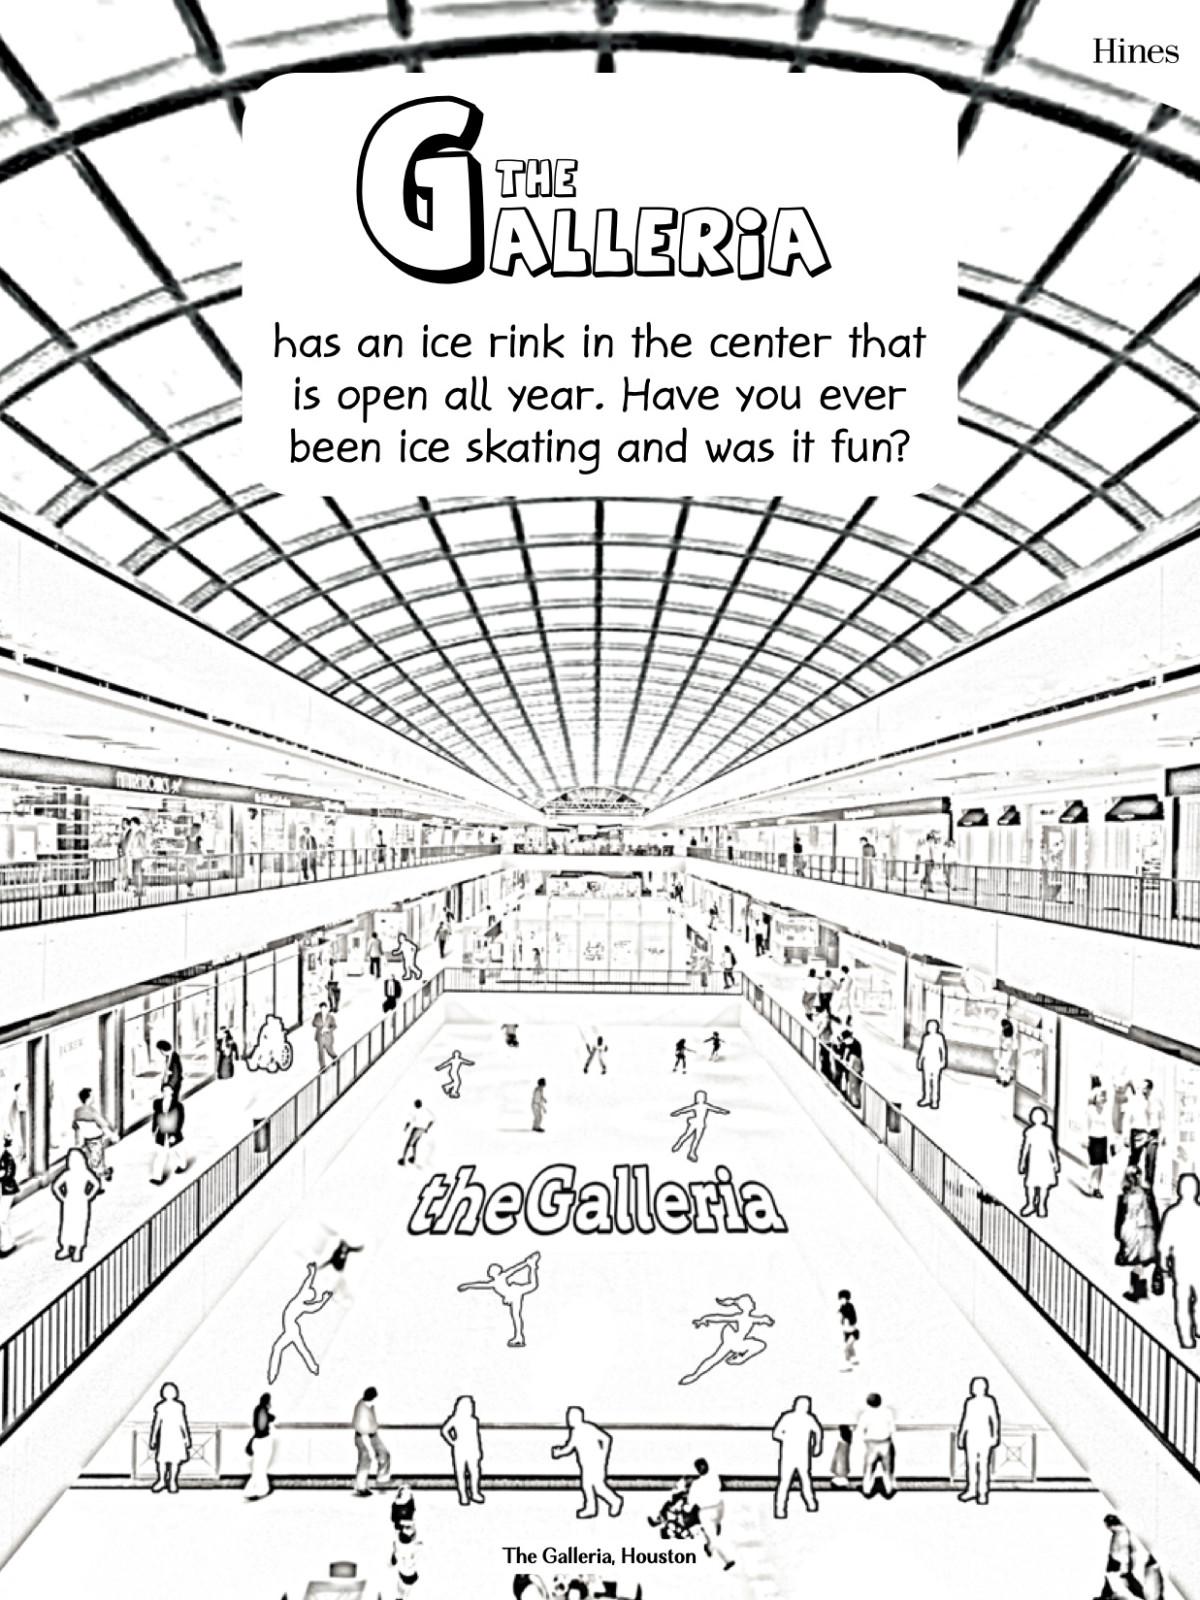 Hines coloring book Galleria